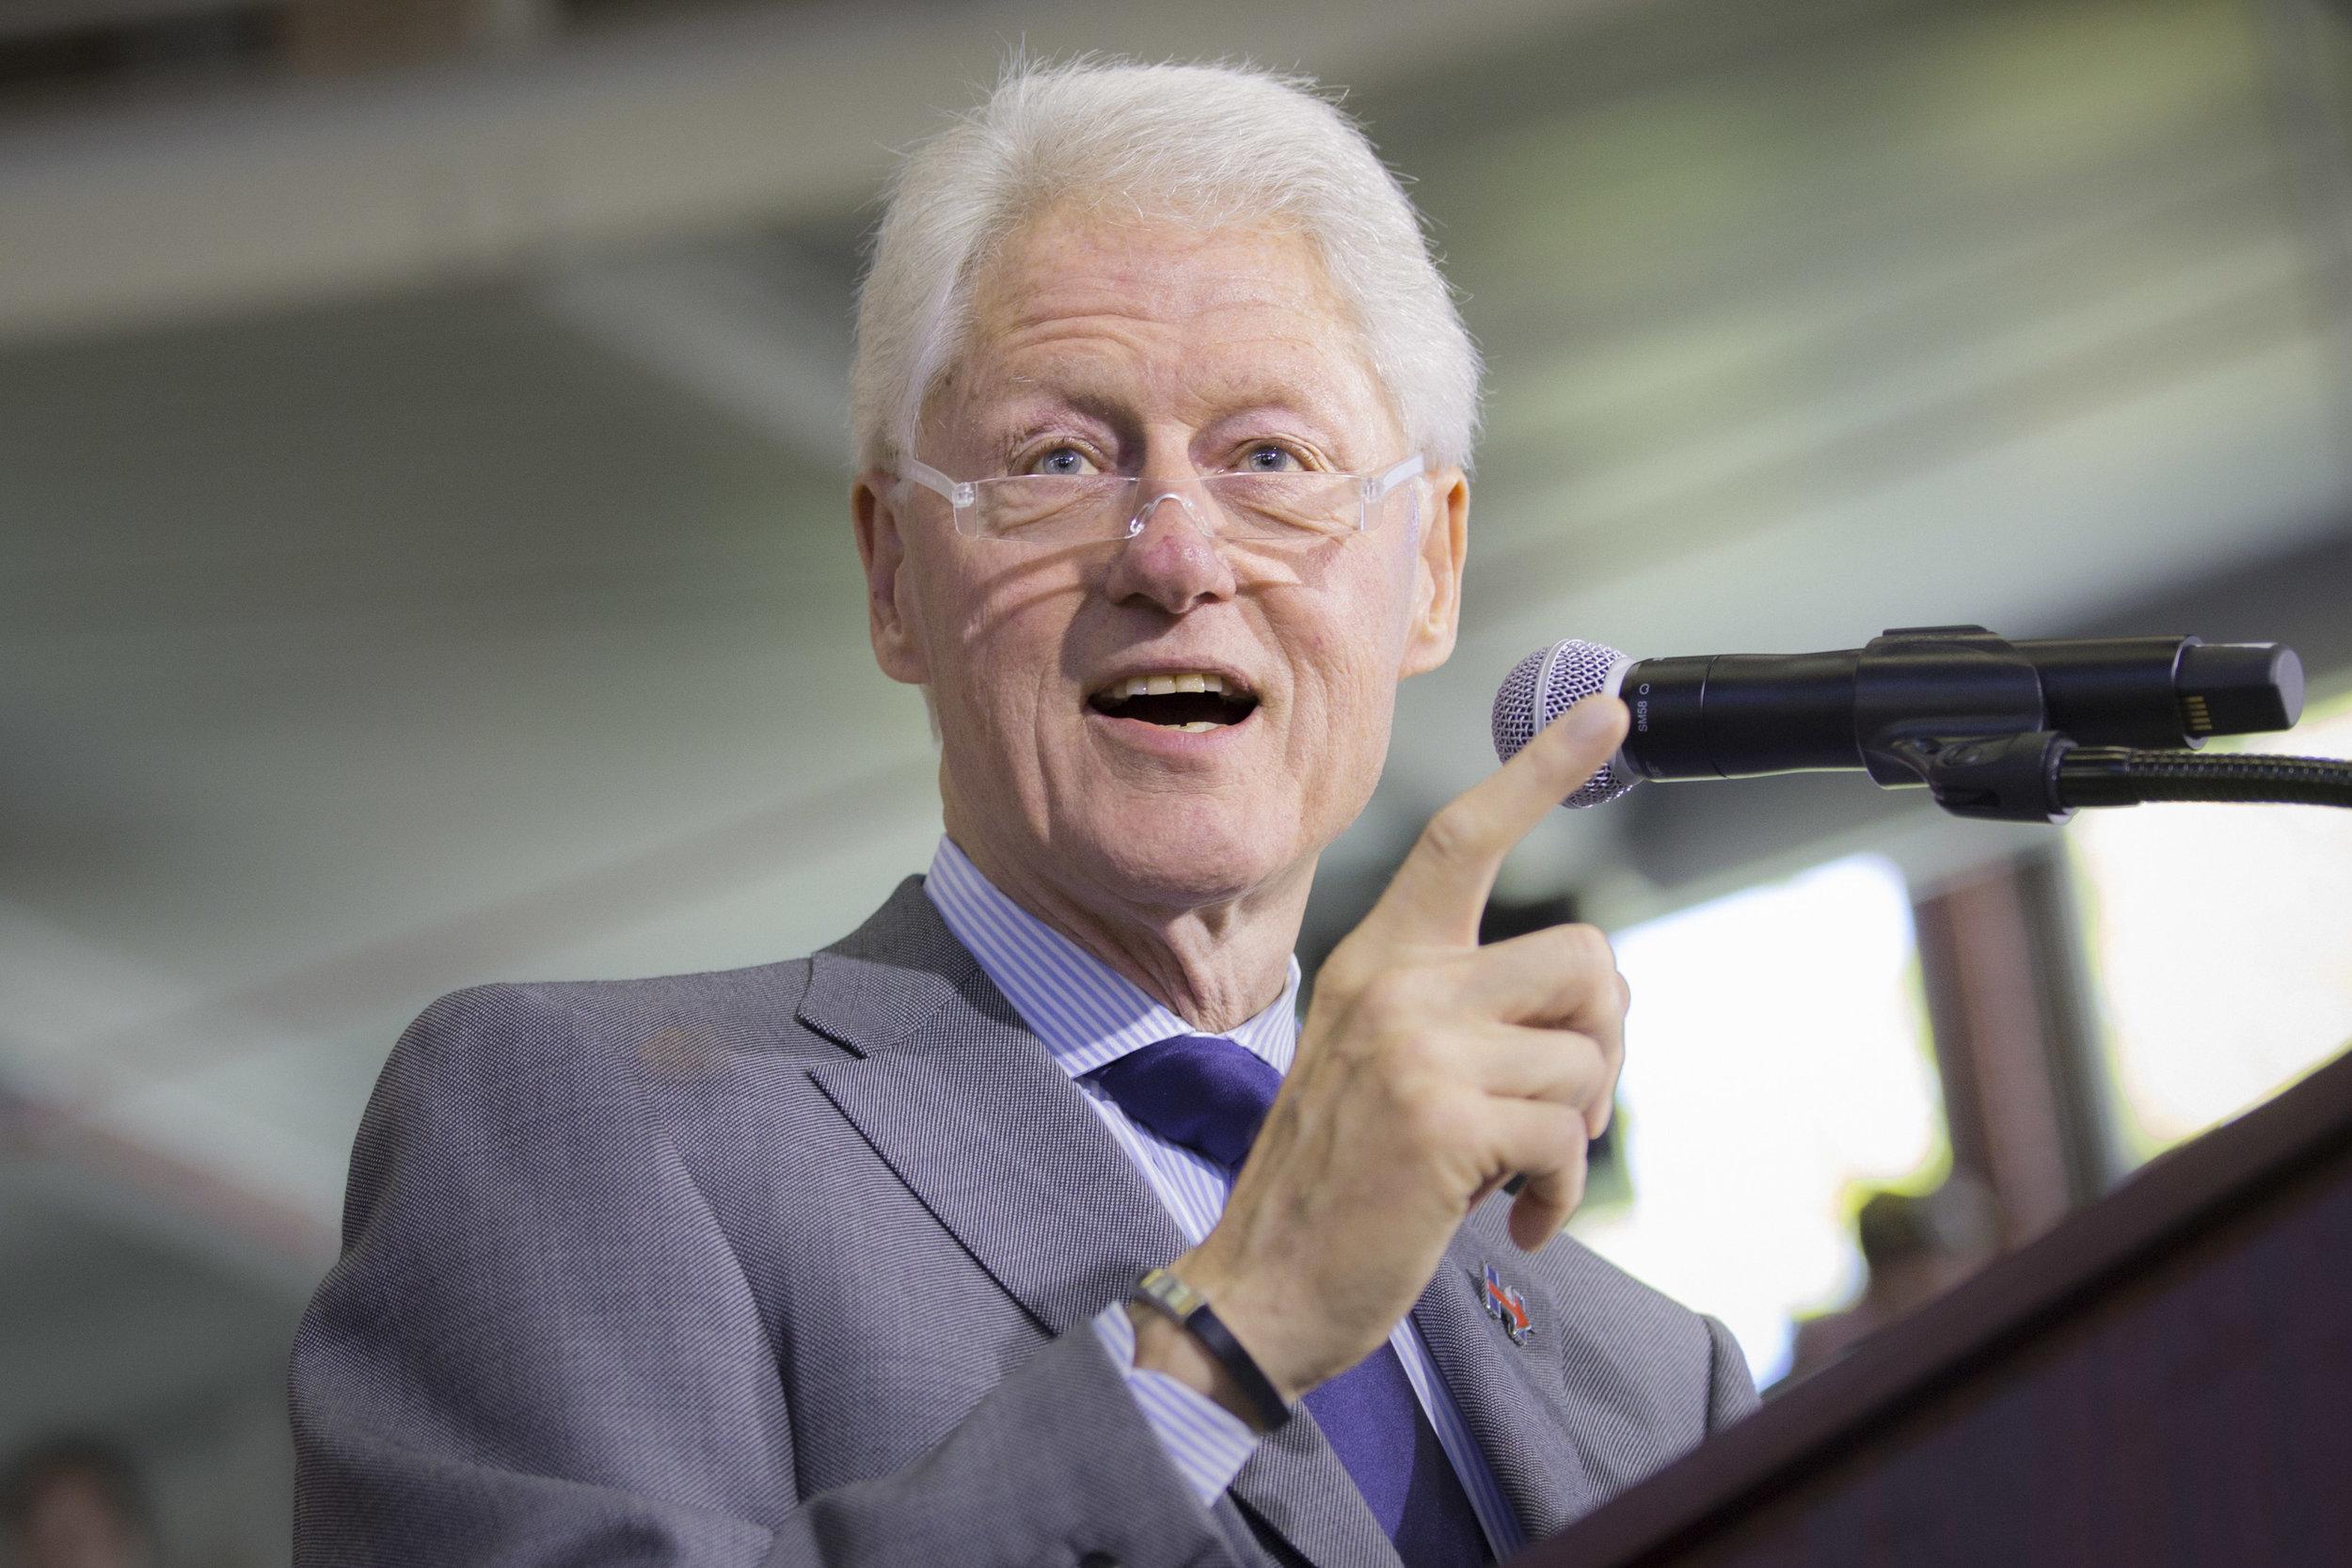 09272016_BJM_Bill_Clinton_in_Toledo_Ohio_12.jpg